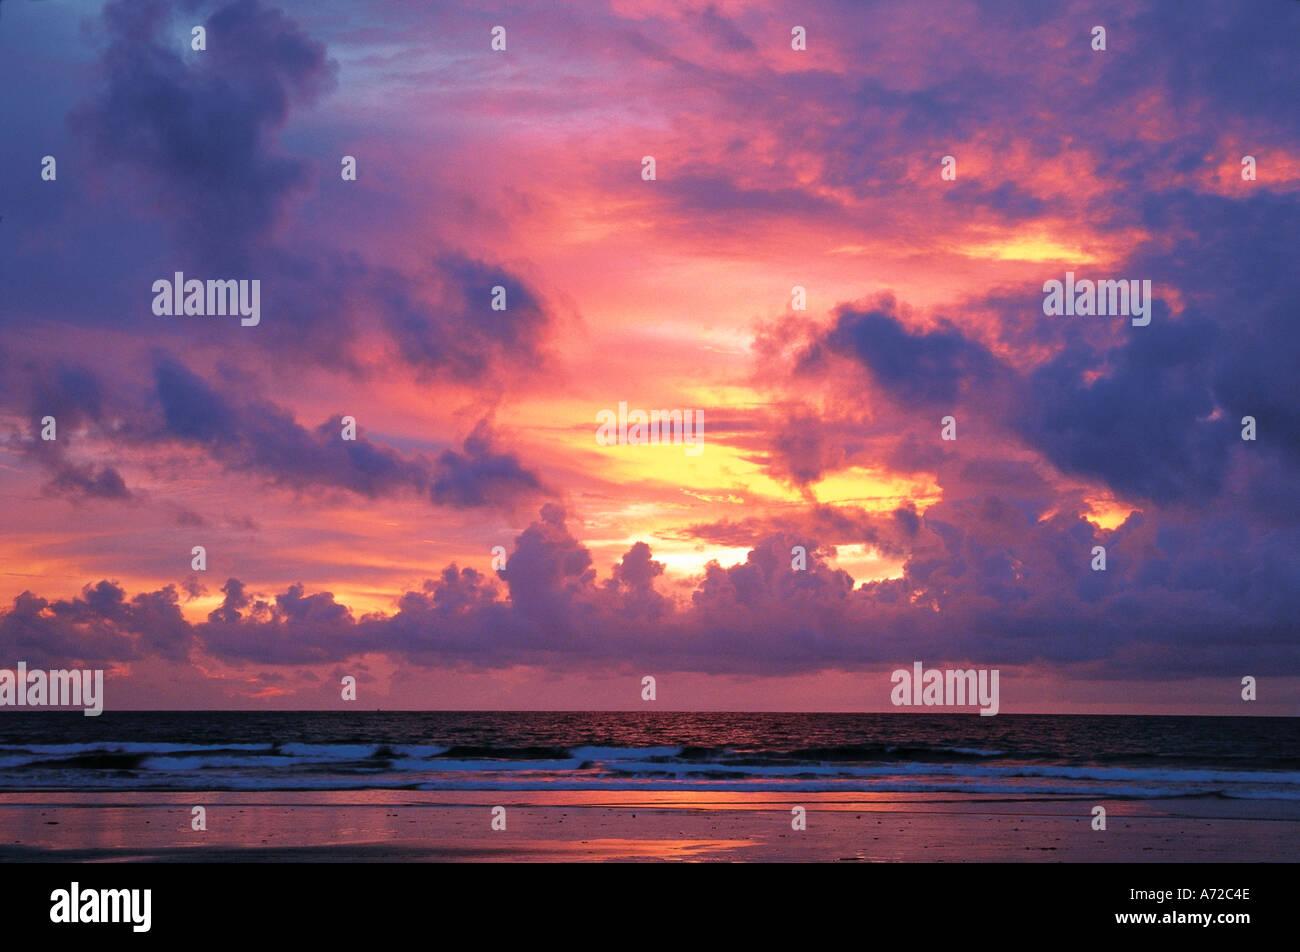 Kuta Beach bei Sonnenuntergang in Bali Indonesien Stockbild